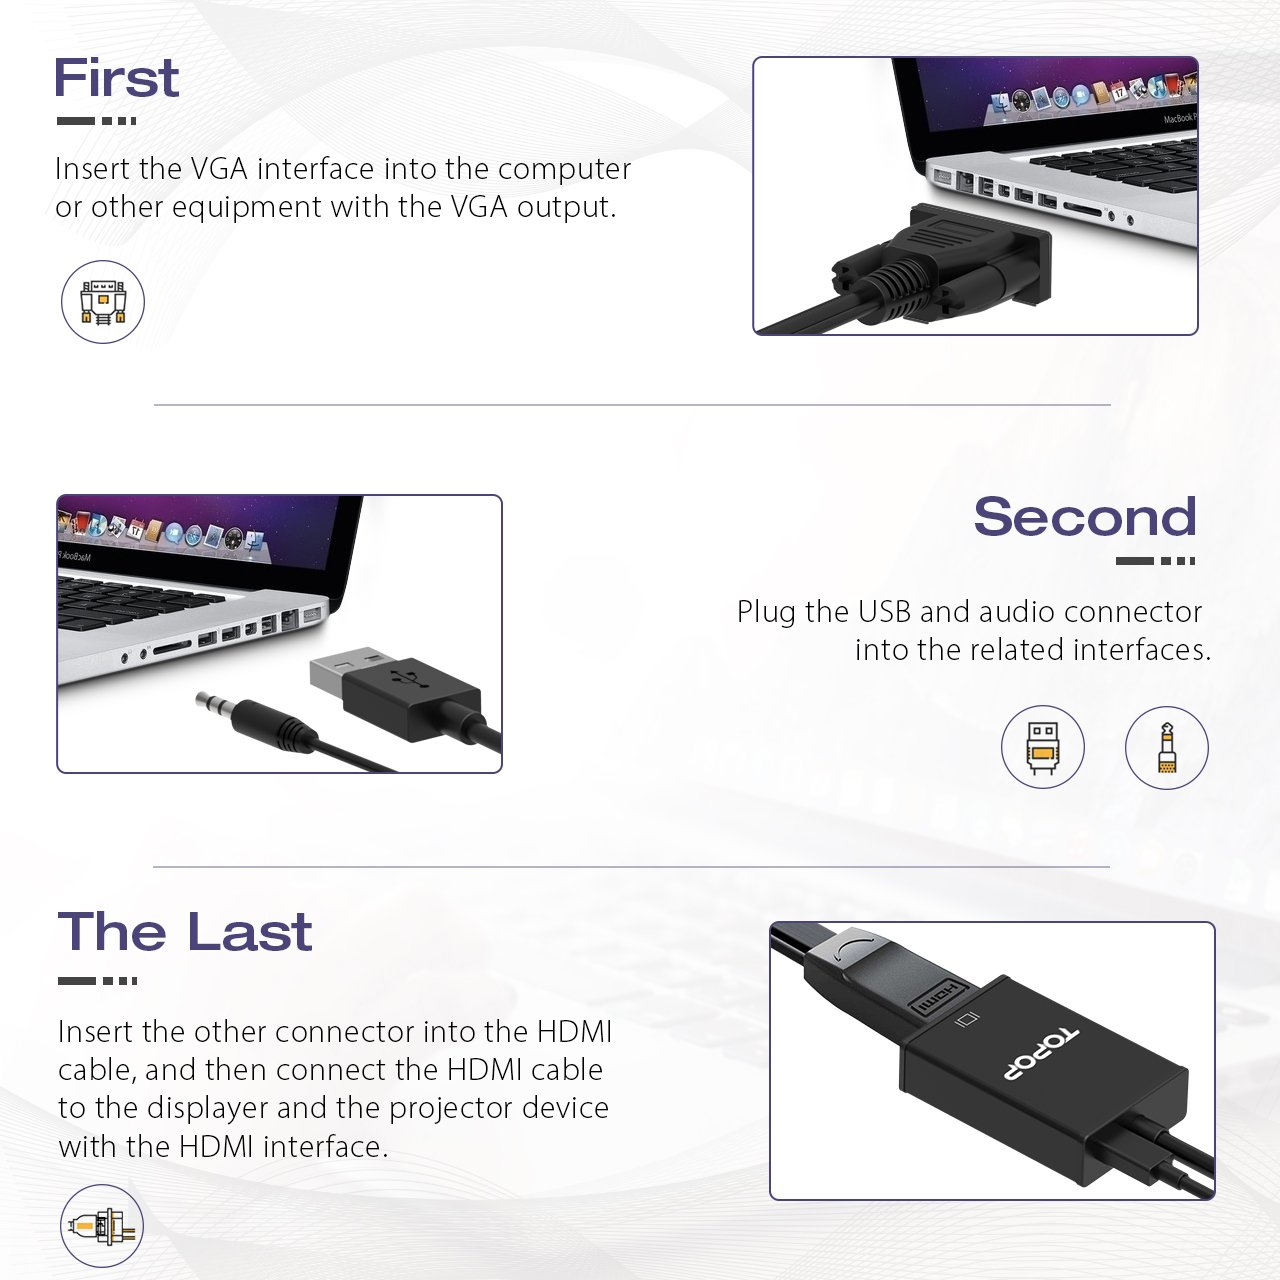 Topop VGA to HDMI Adapter Convertor Cable Converter: Amazon.co.uk ...